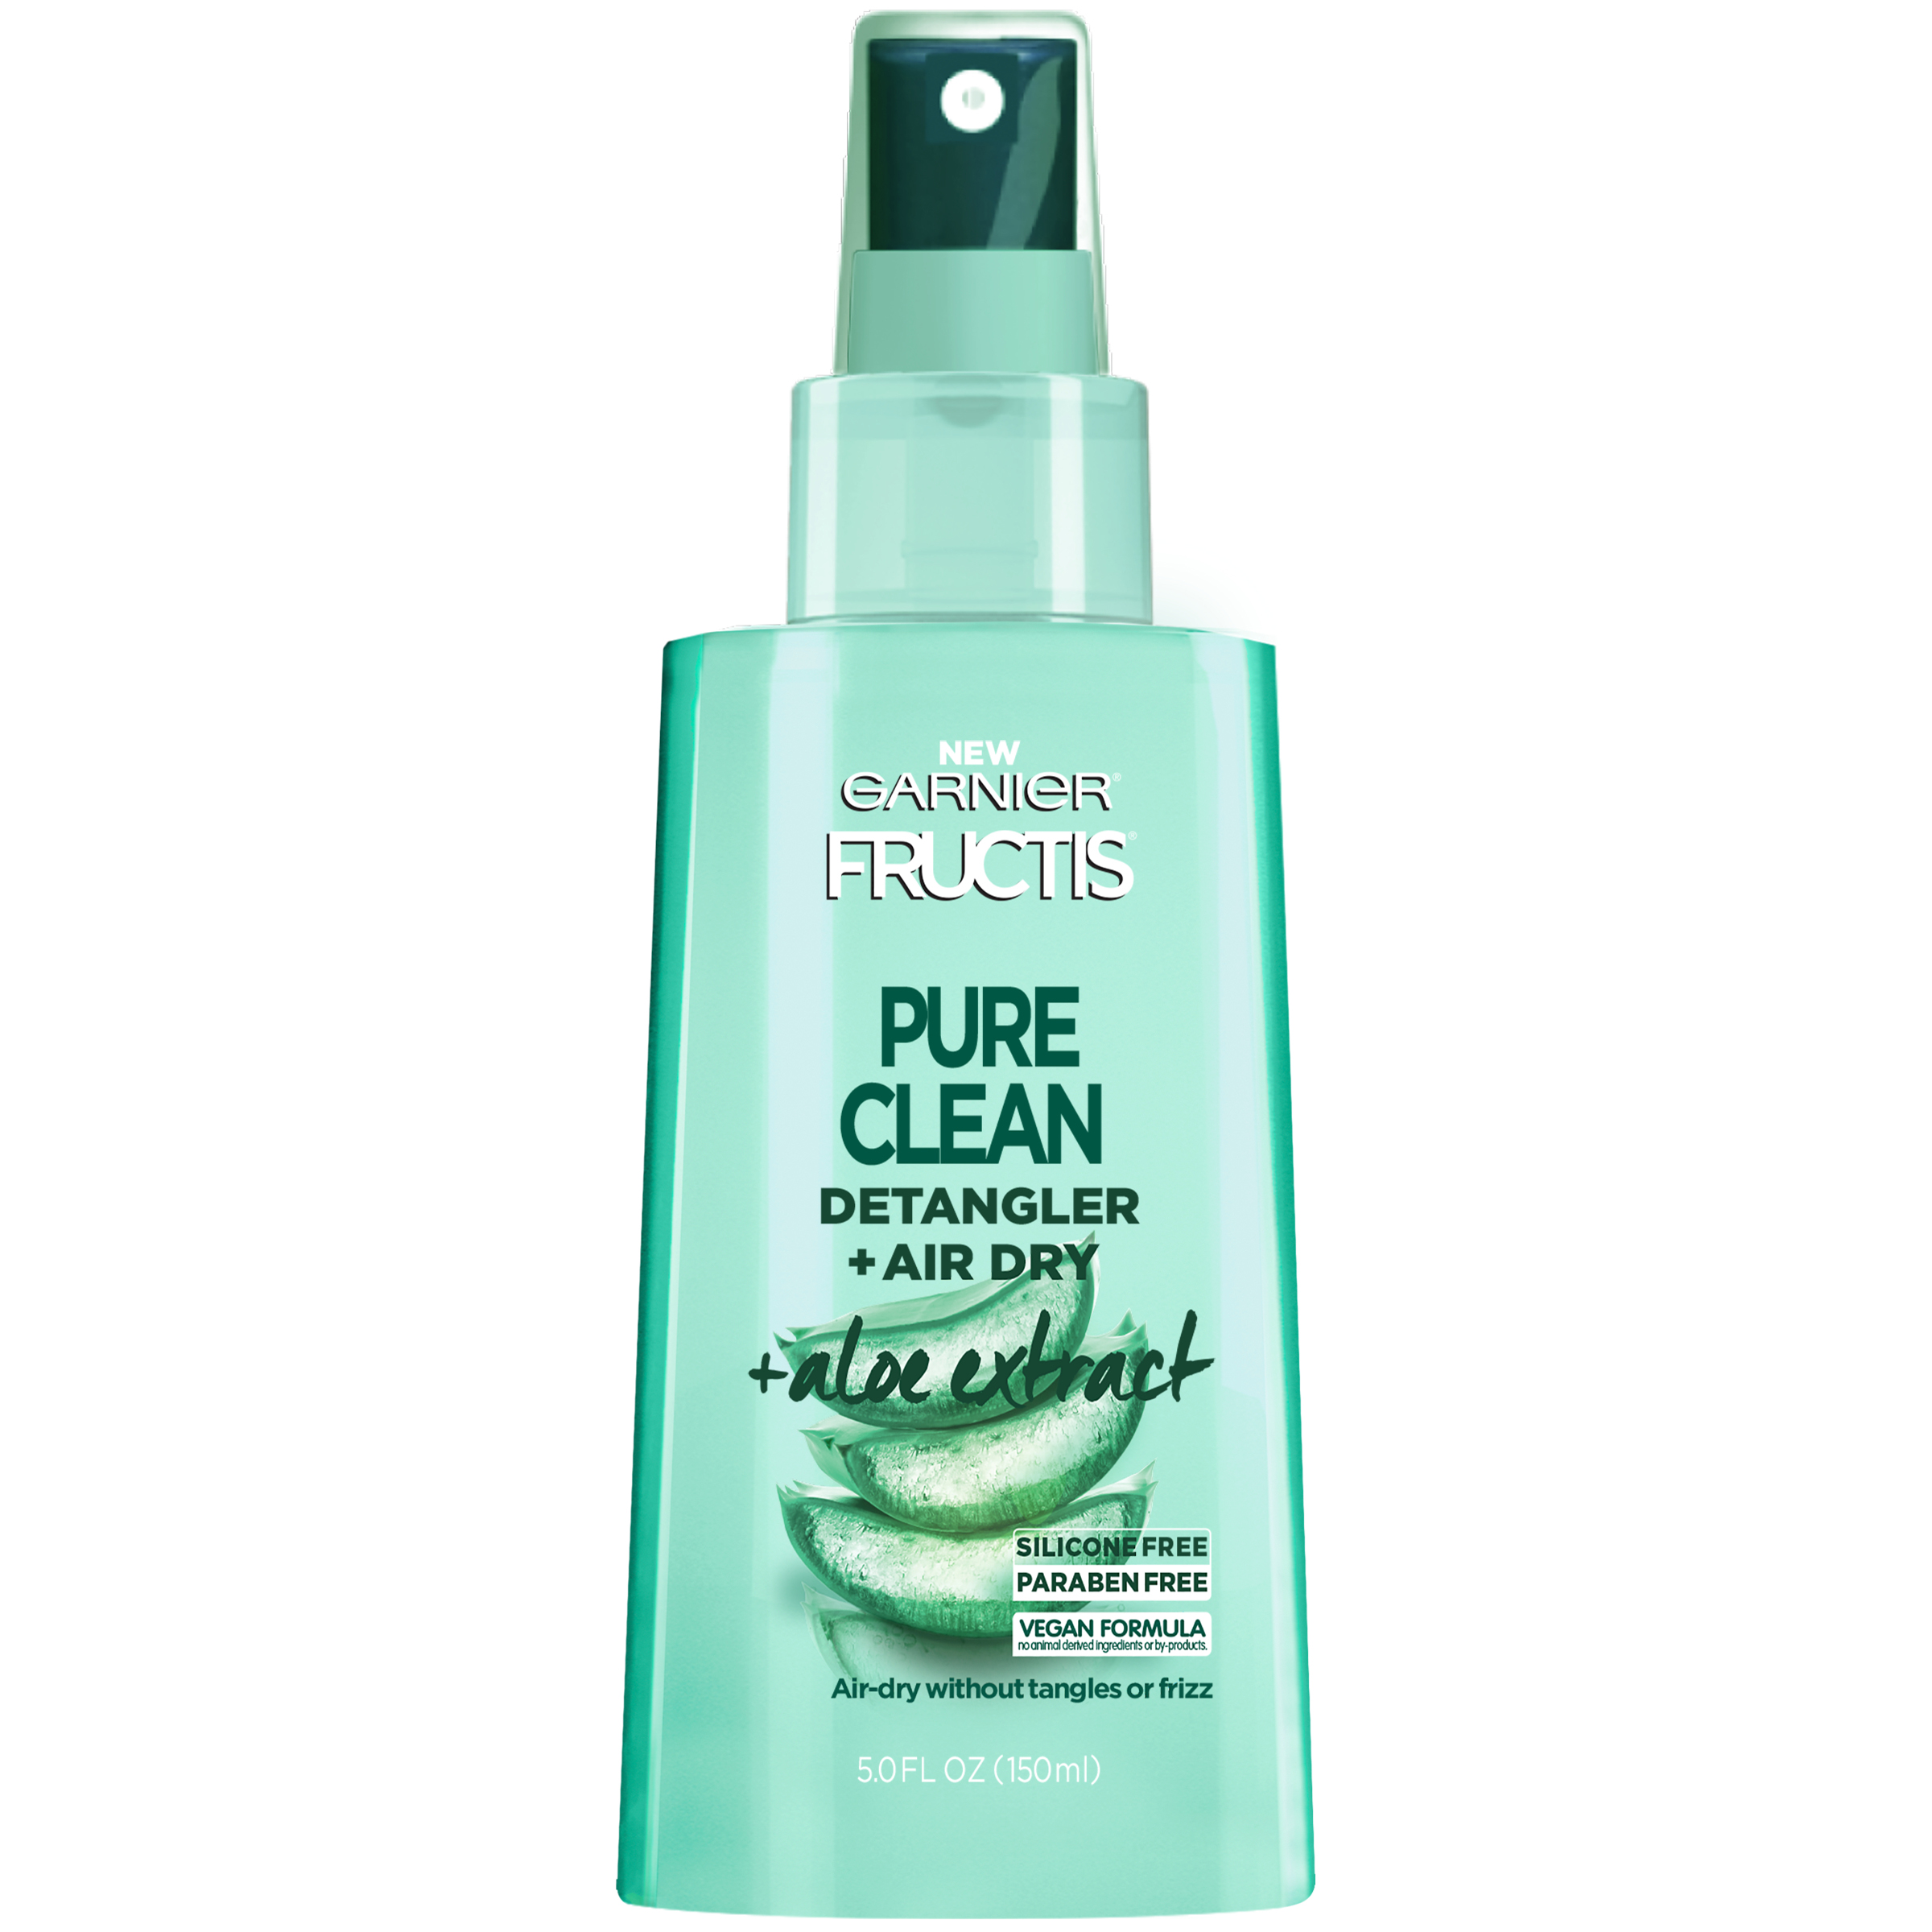 garnier-fructis-style-pure-clean-detangler-air-dry-with-aloe-extract.jpg